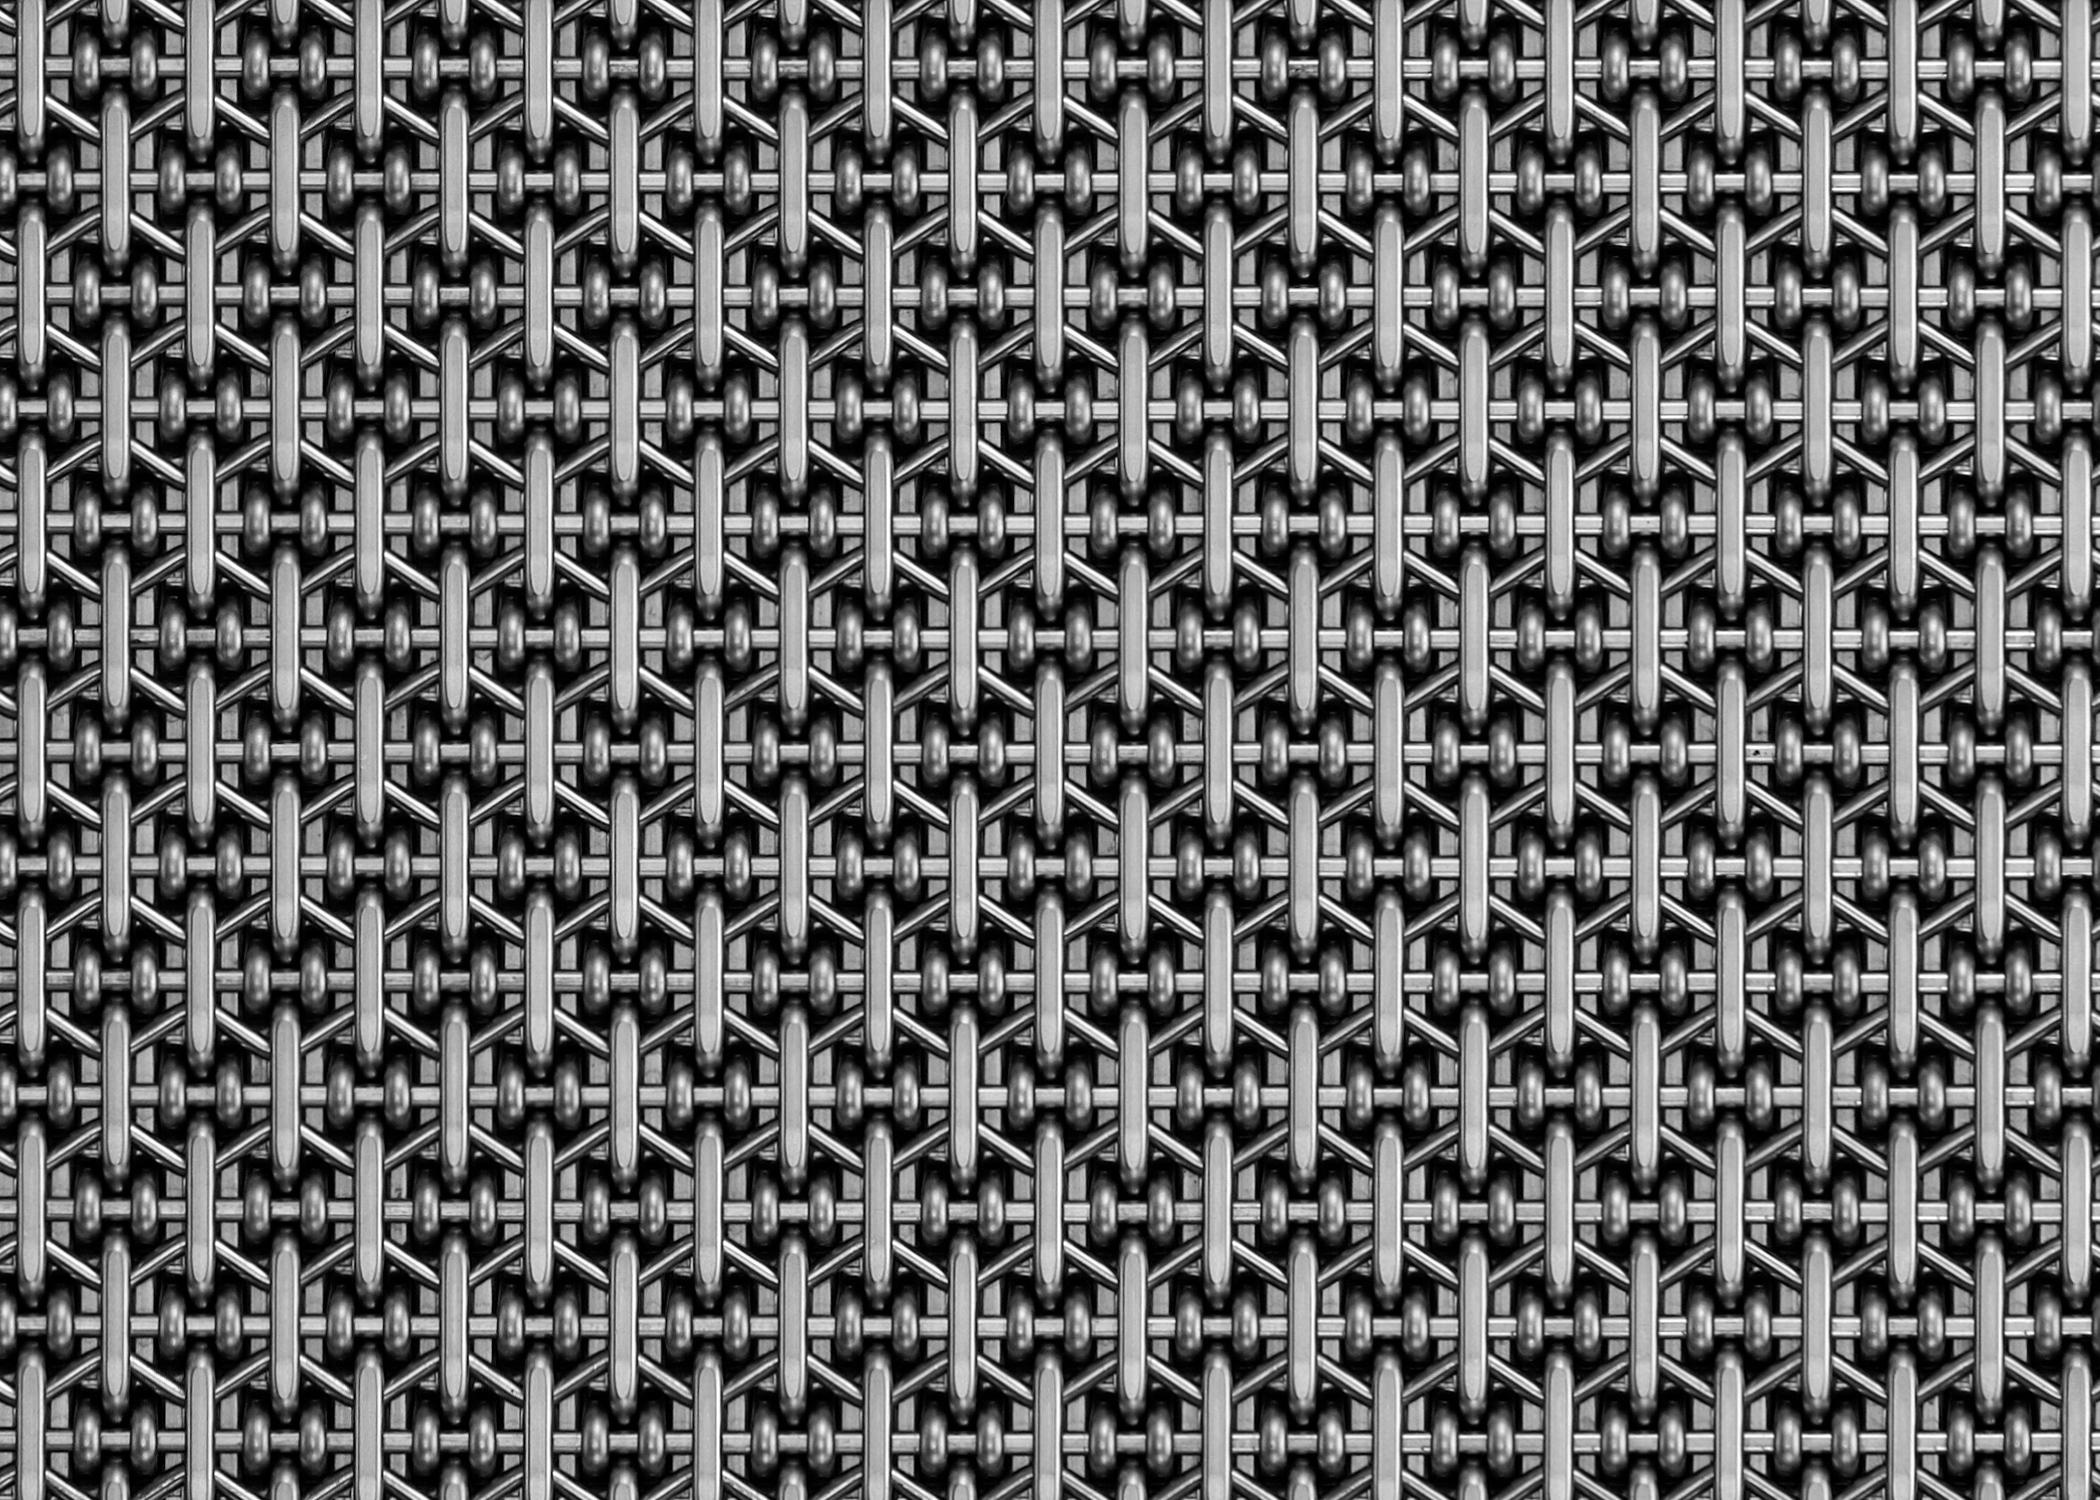 print ready image for XDFZ-1